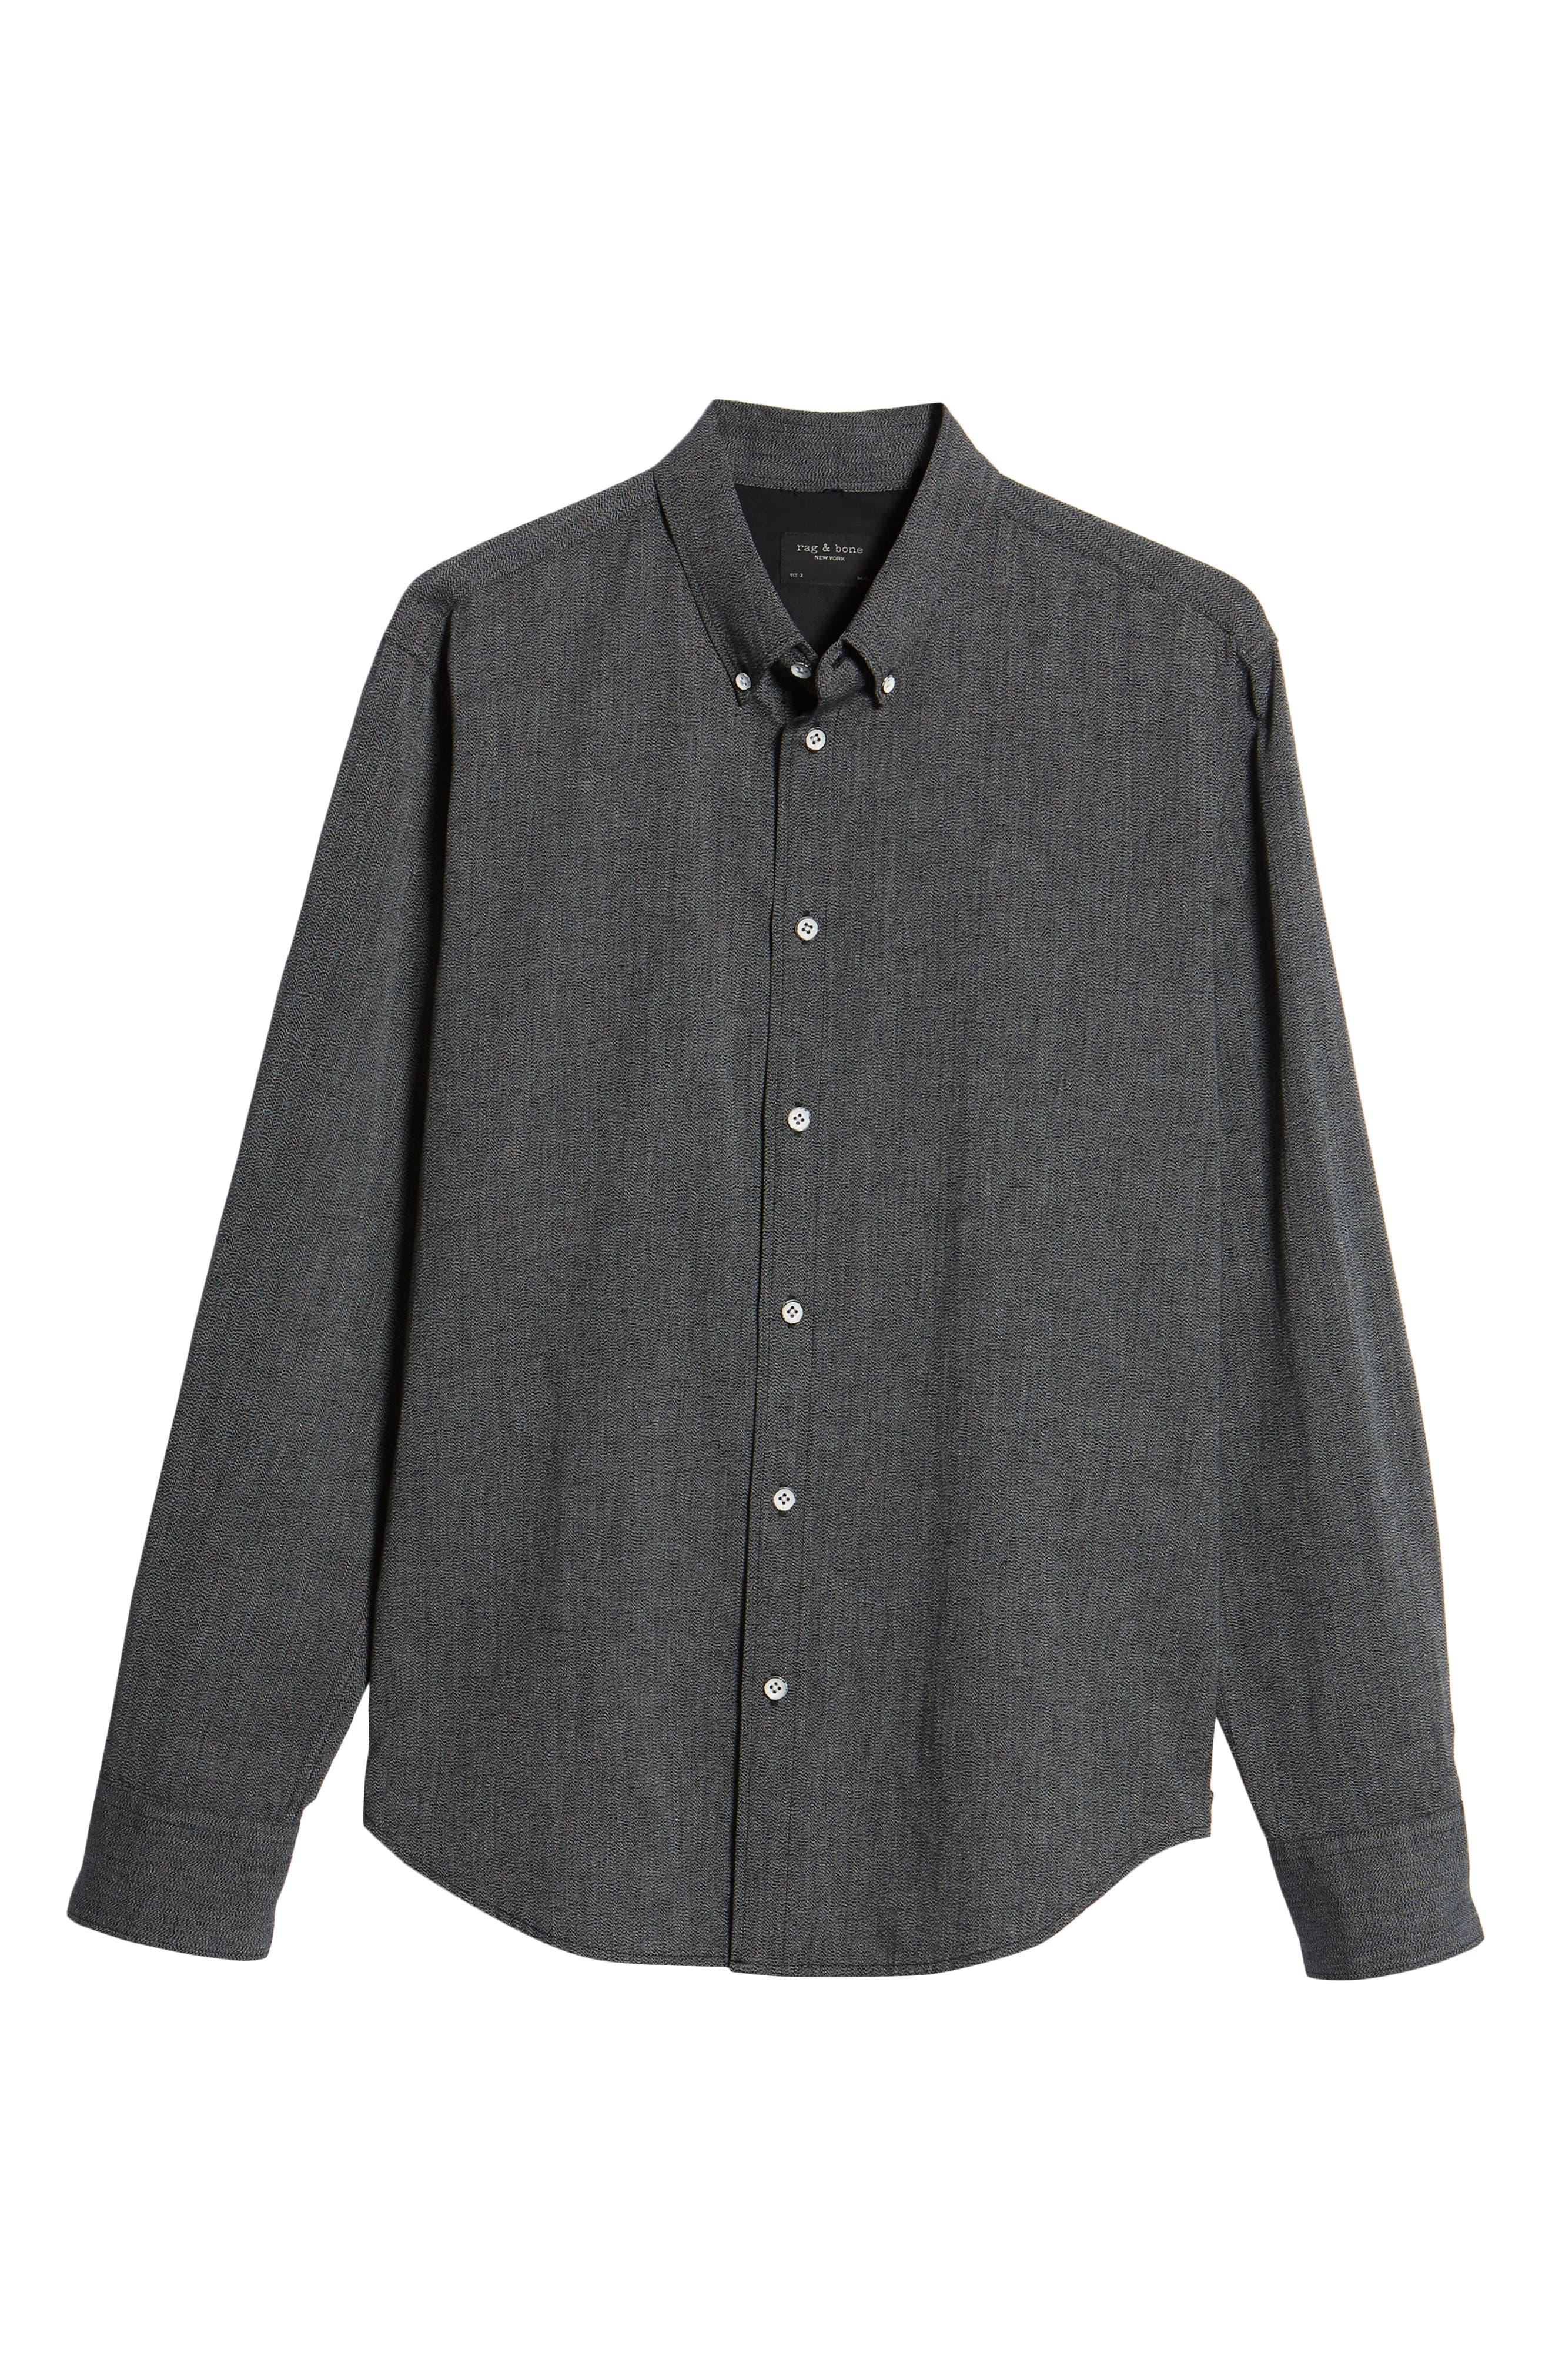 RAG & BONE,                             Tomlin Slim Fit Sport Shirt,                             Alternate thumbnail 6, color,                             020